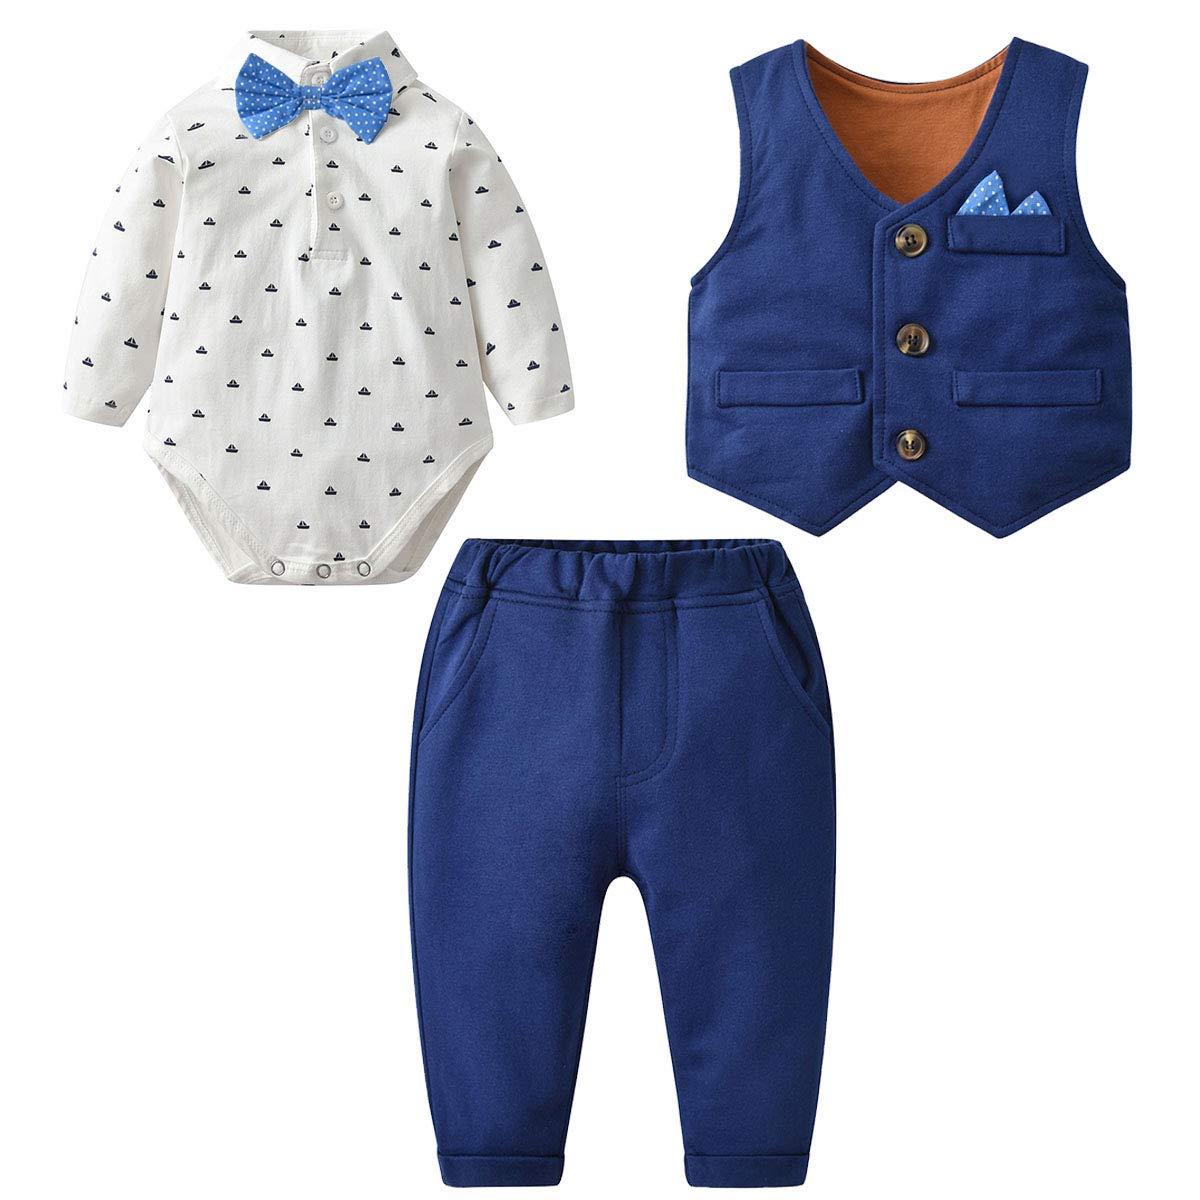 Kanodan Baby Boy Waistcoat Gentleman Suit Long Sleeve 3 Pieces Wedding Outfits (Royal Blue 3, 6-9Months) by Kanodan